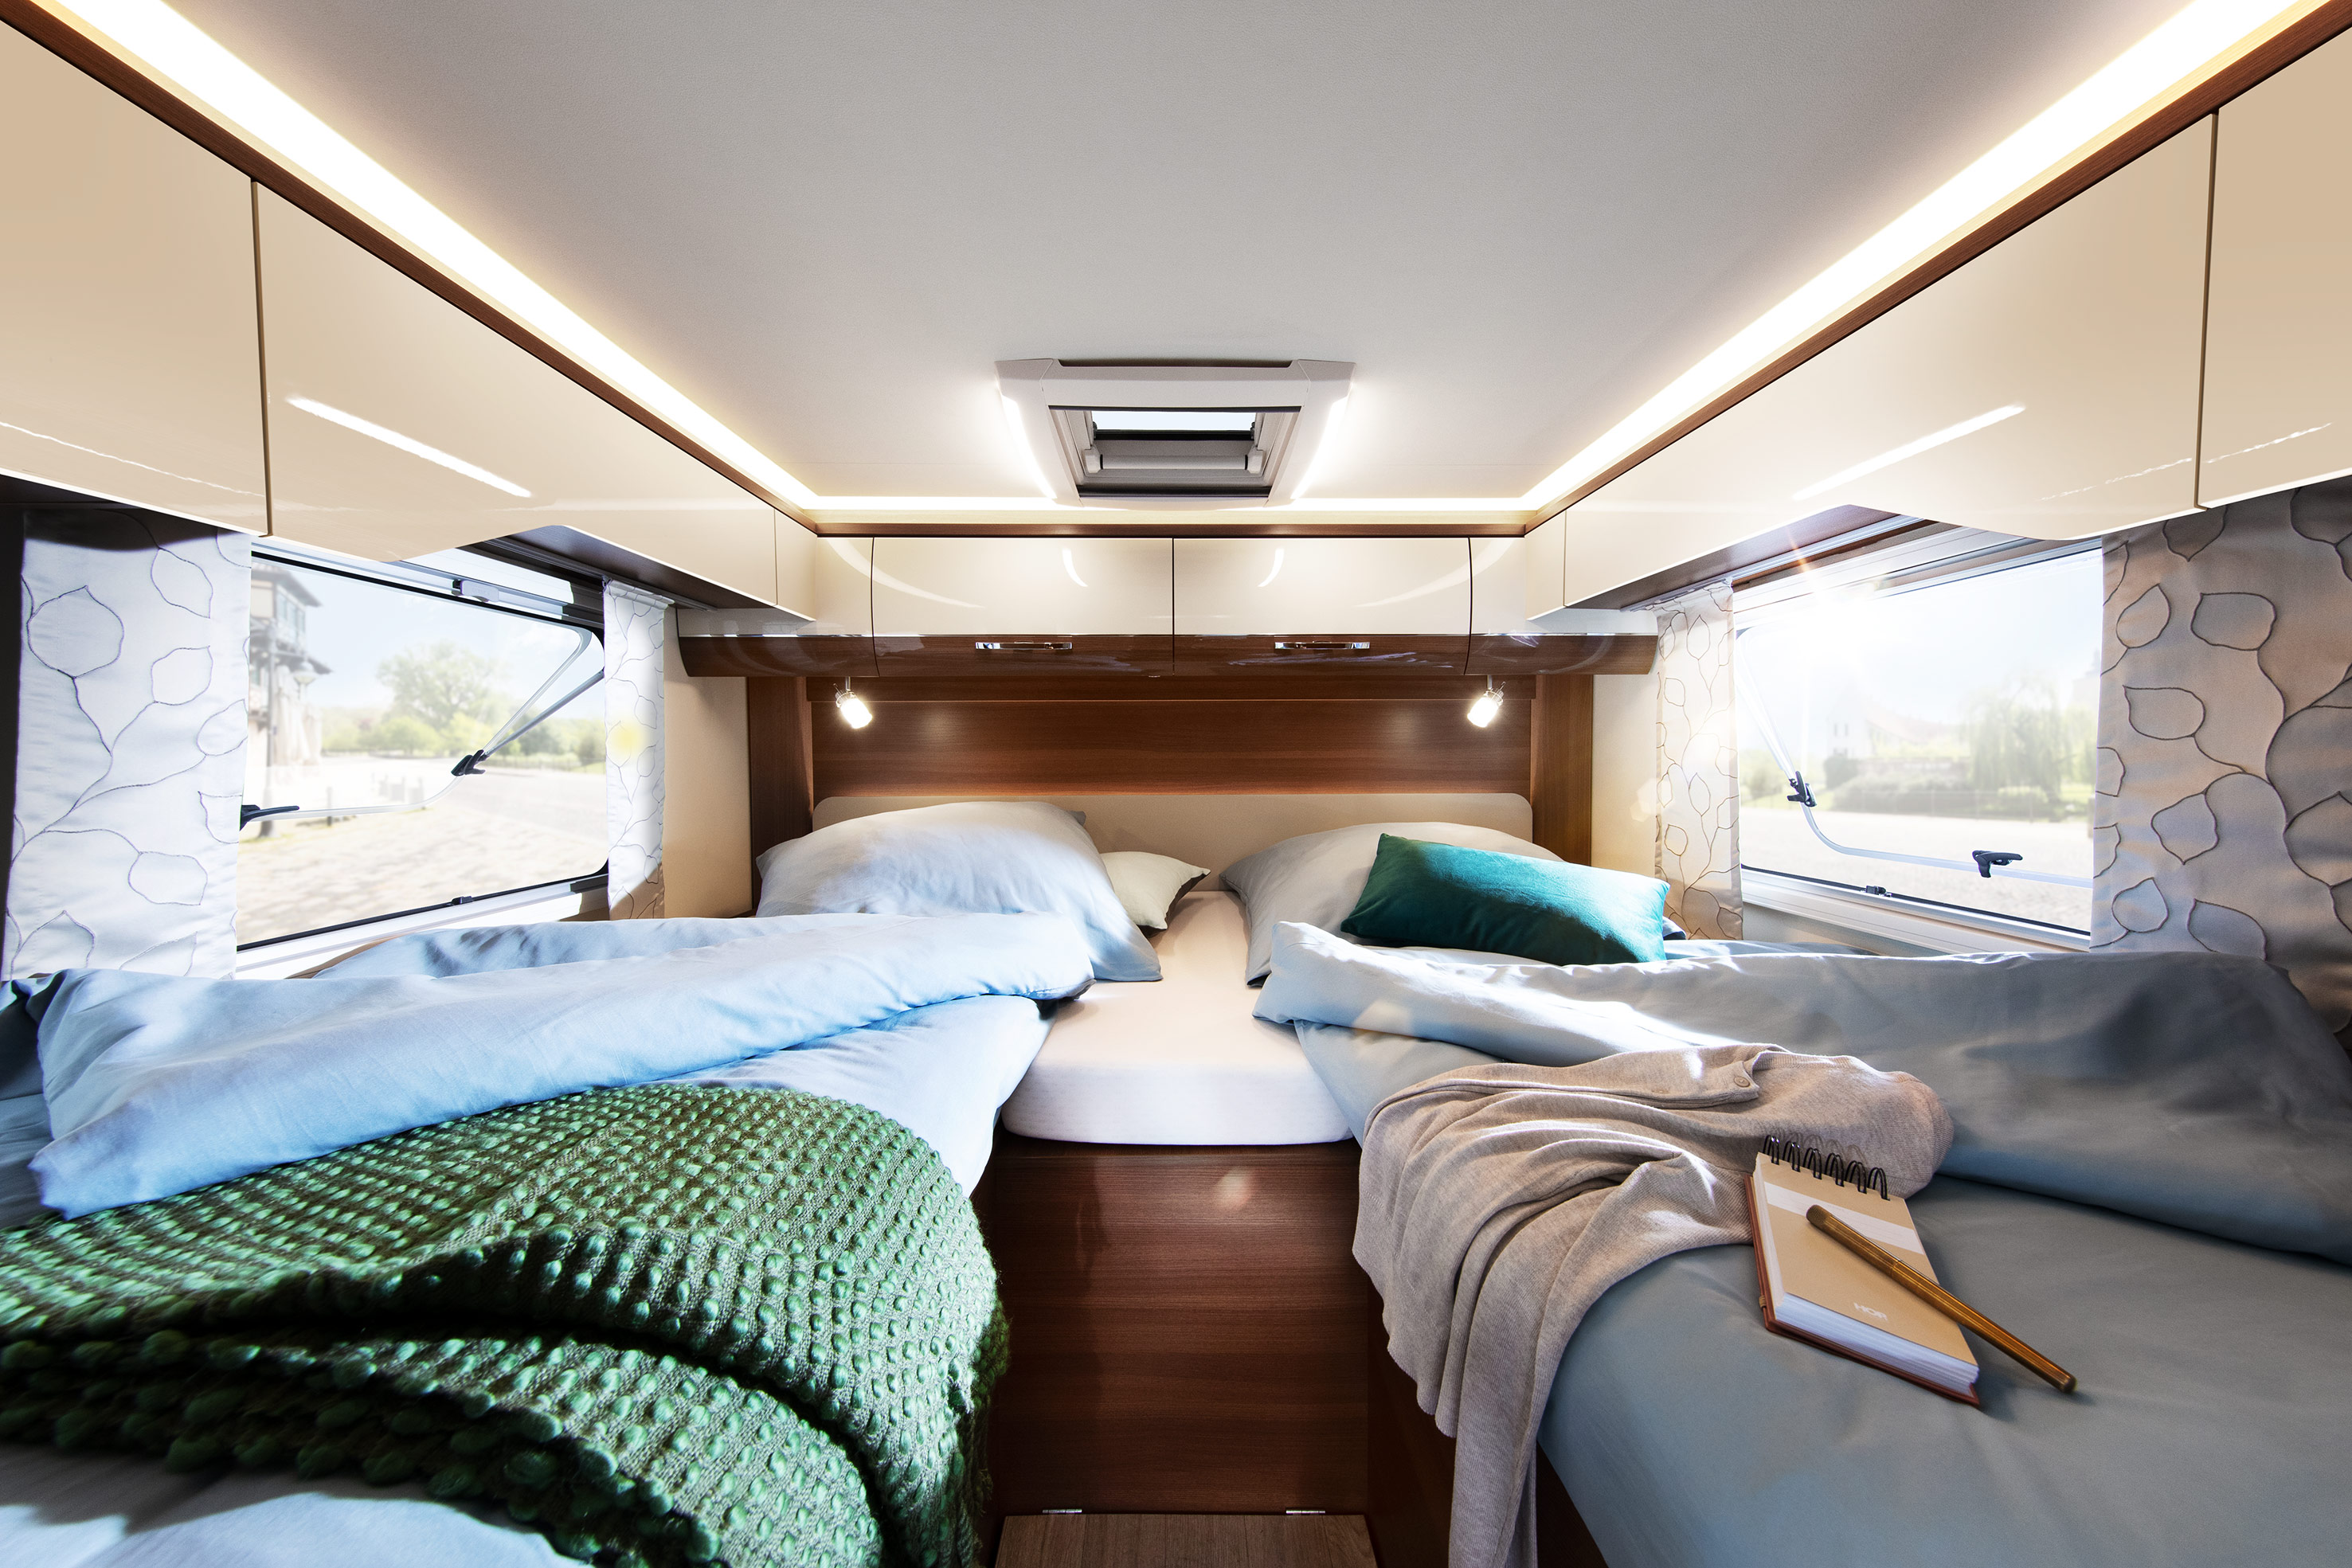 LMC Comfort TI672g - slaapkamer camper